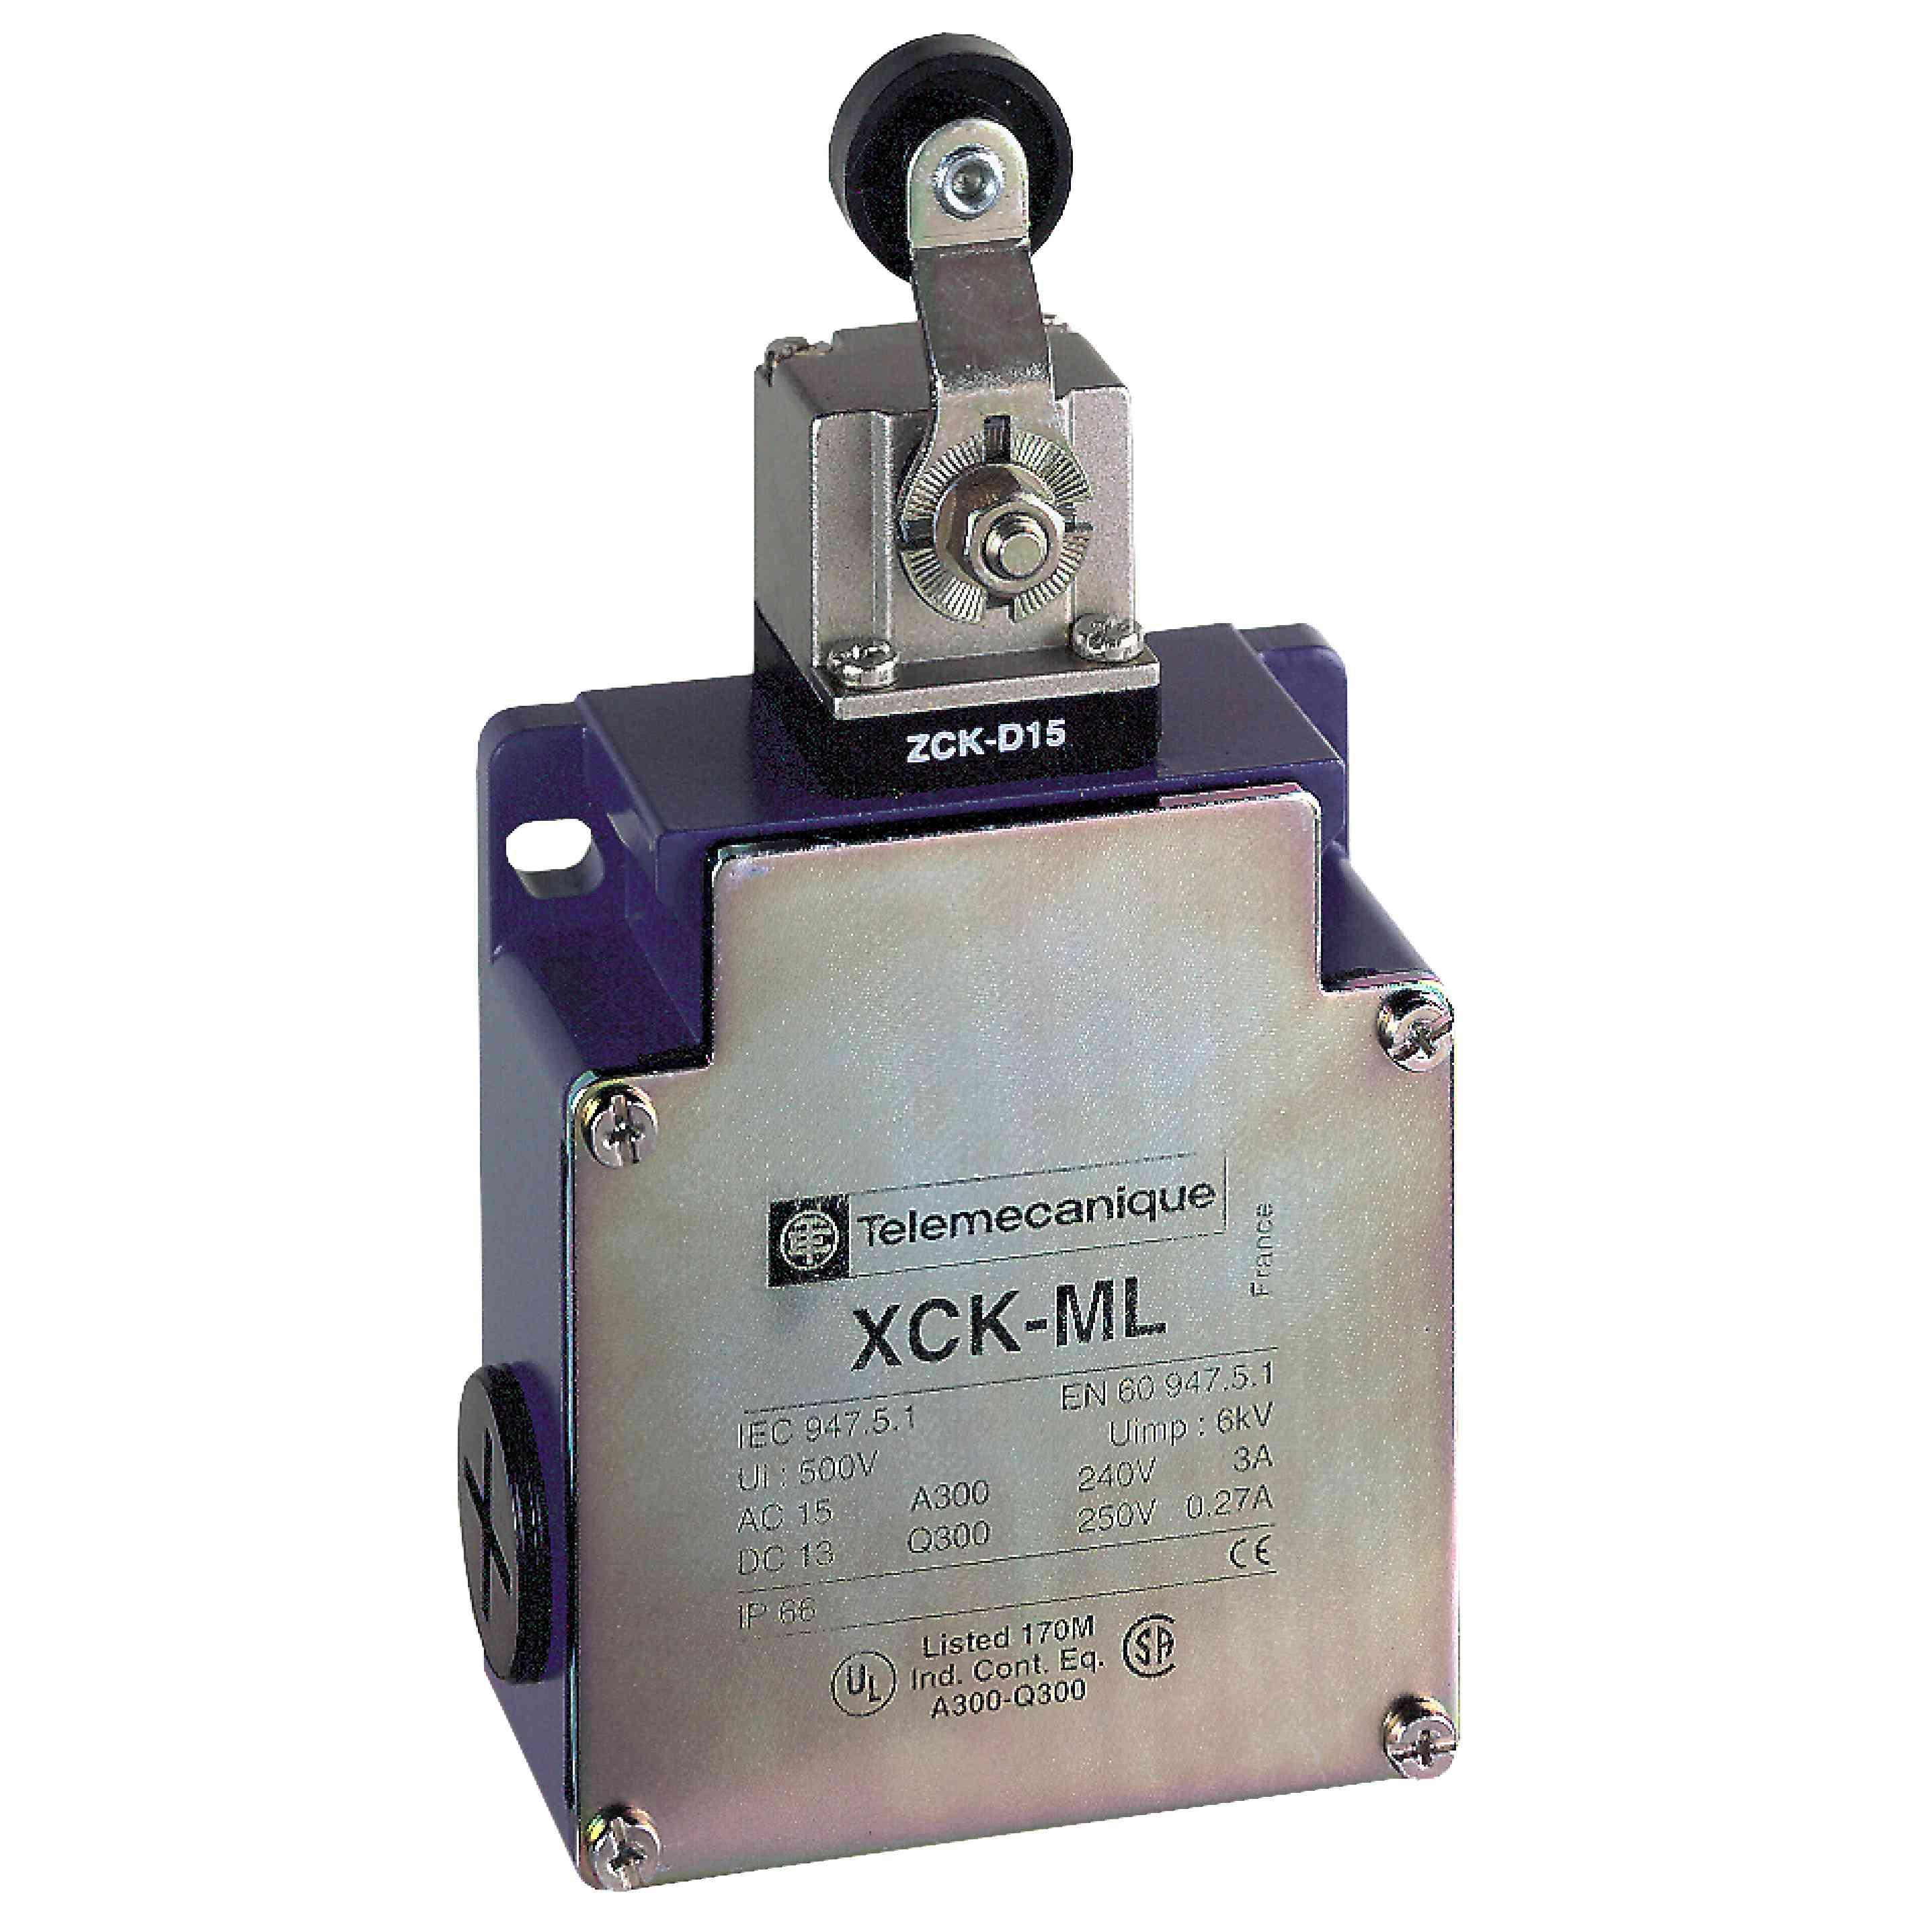 Omej. stik. XCKML - termoplastični vzvod valja - 2x(1NC+1NO) - proženje - M20